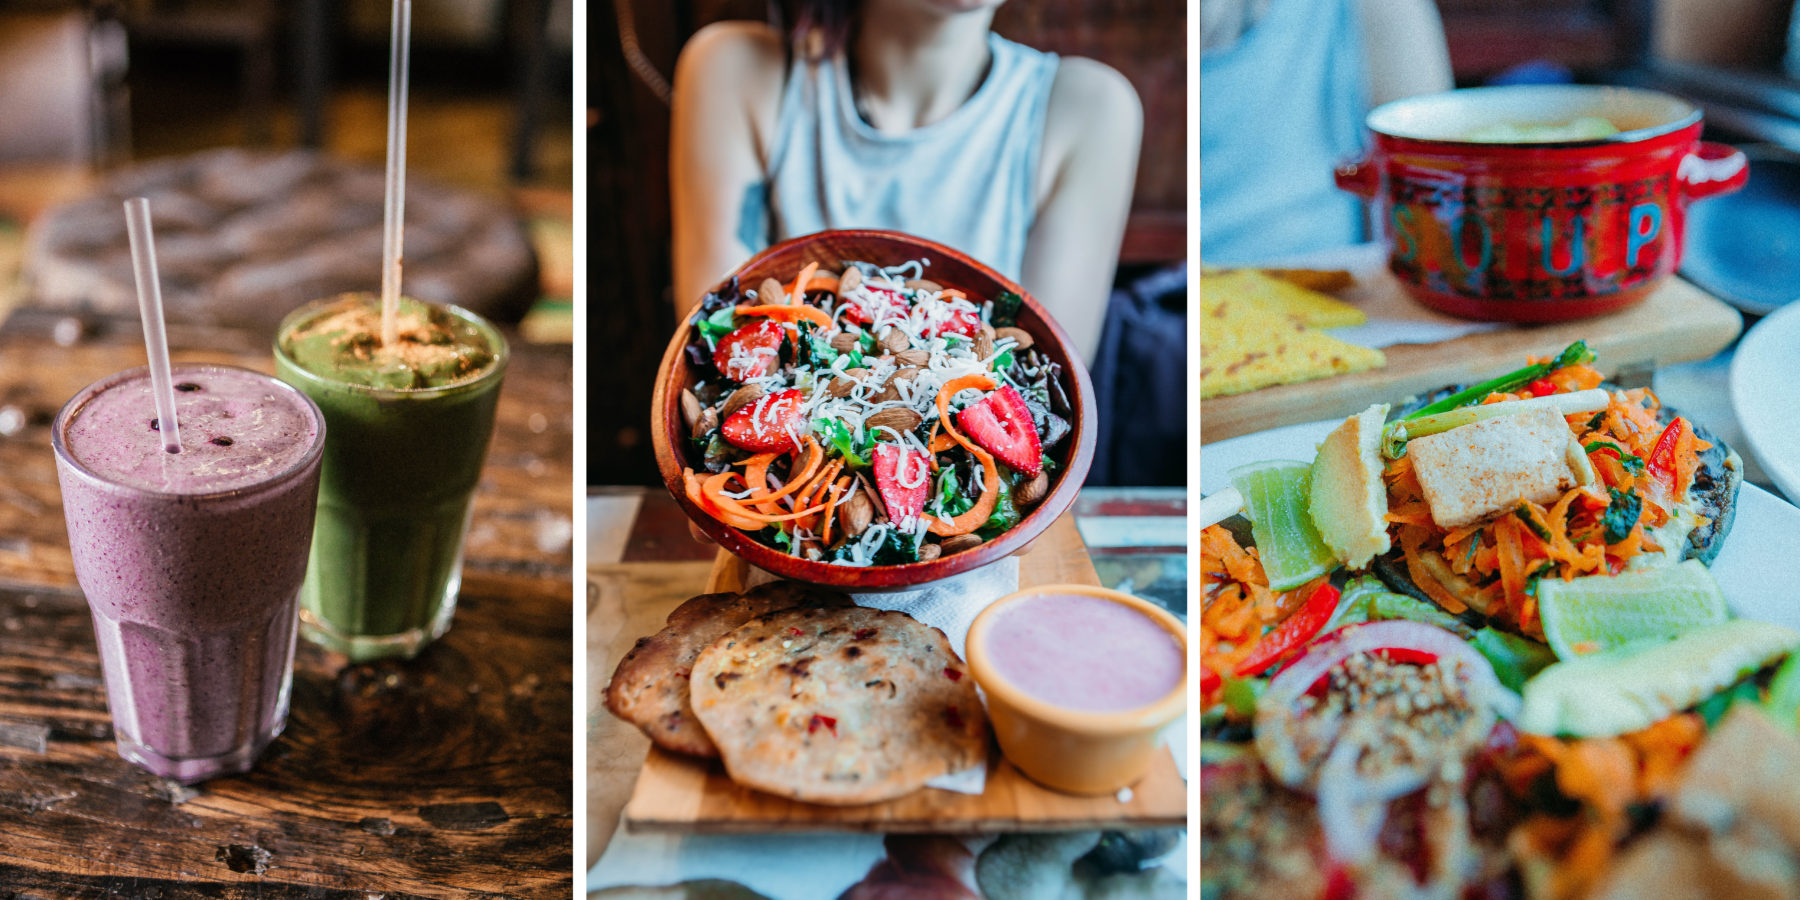 guatemala colourful healthy vegan food authentic vegan version of tacos antigua samsara cruelty free